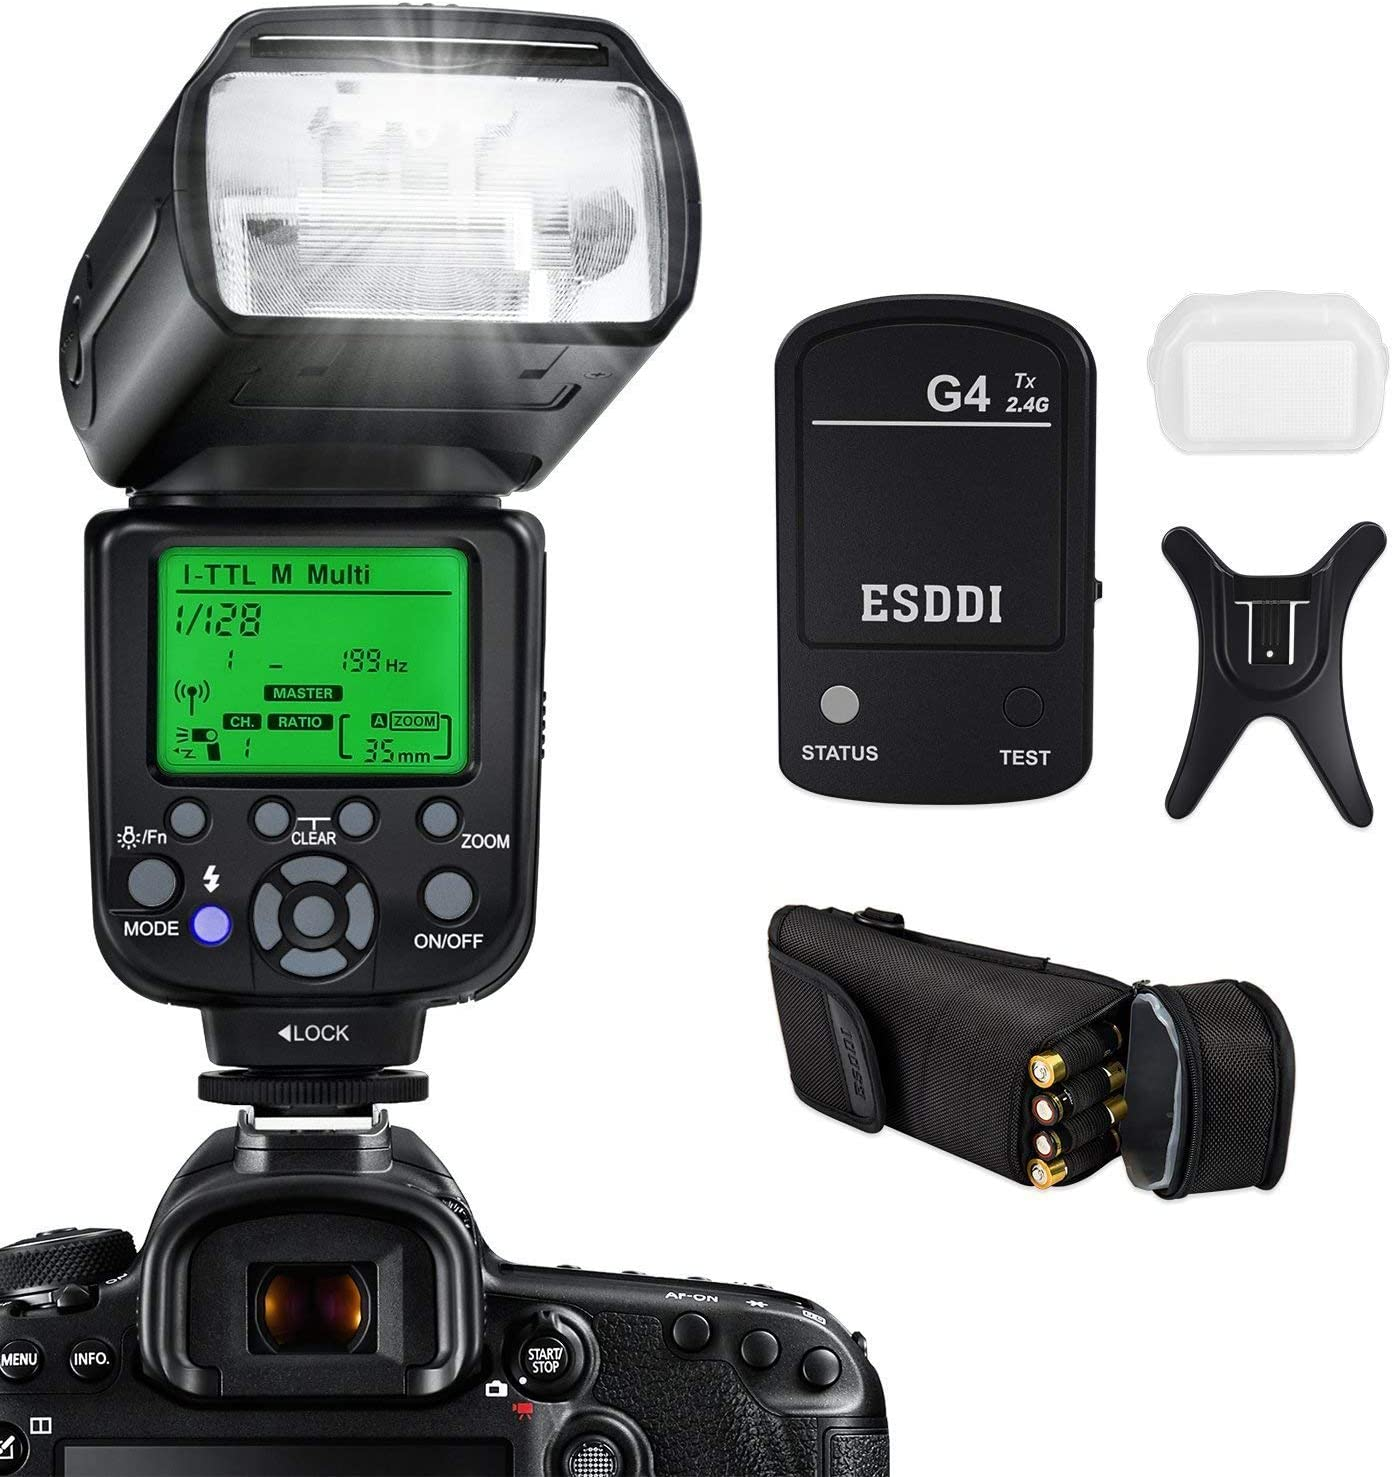 I-TTL 1//8000 HSS GN58 Camera Flash for Nikon DSLR Camera Multi ESDDI Wireless Camera Flash Set Include 2.4G Wireless Flash Trigger Cold Shoe Base Bracket and Accessories